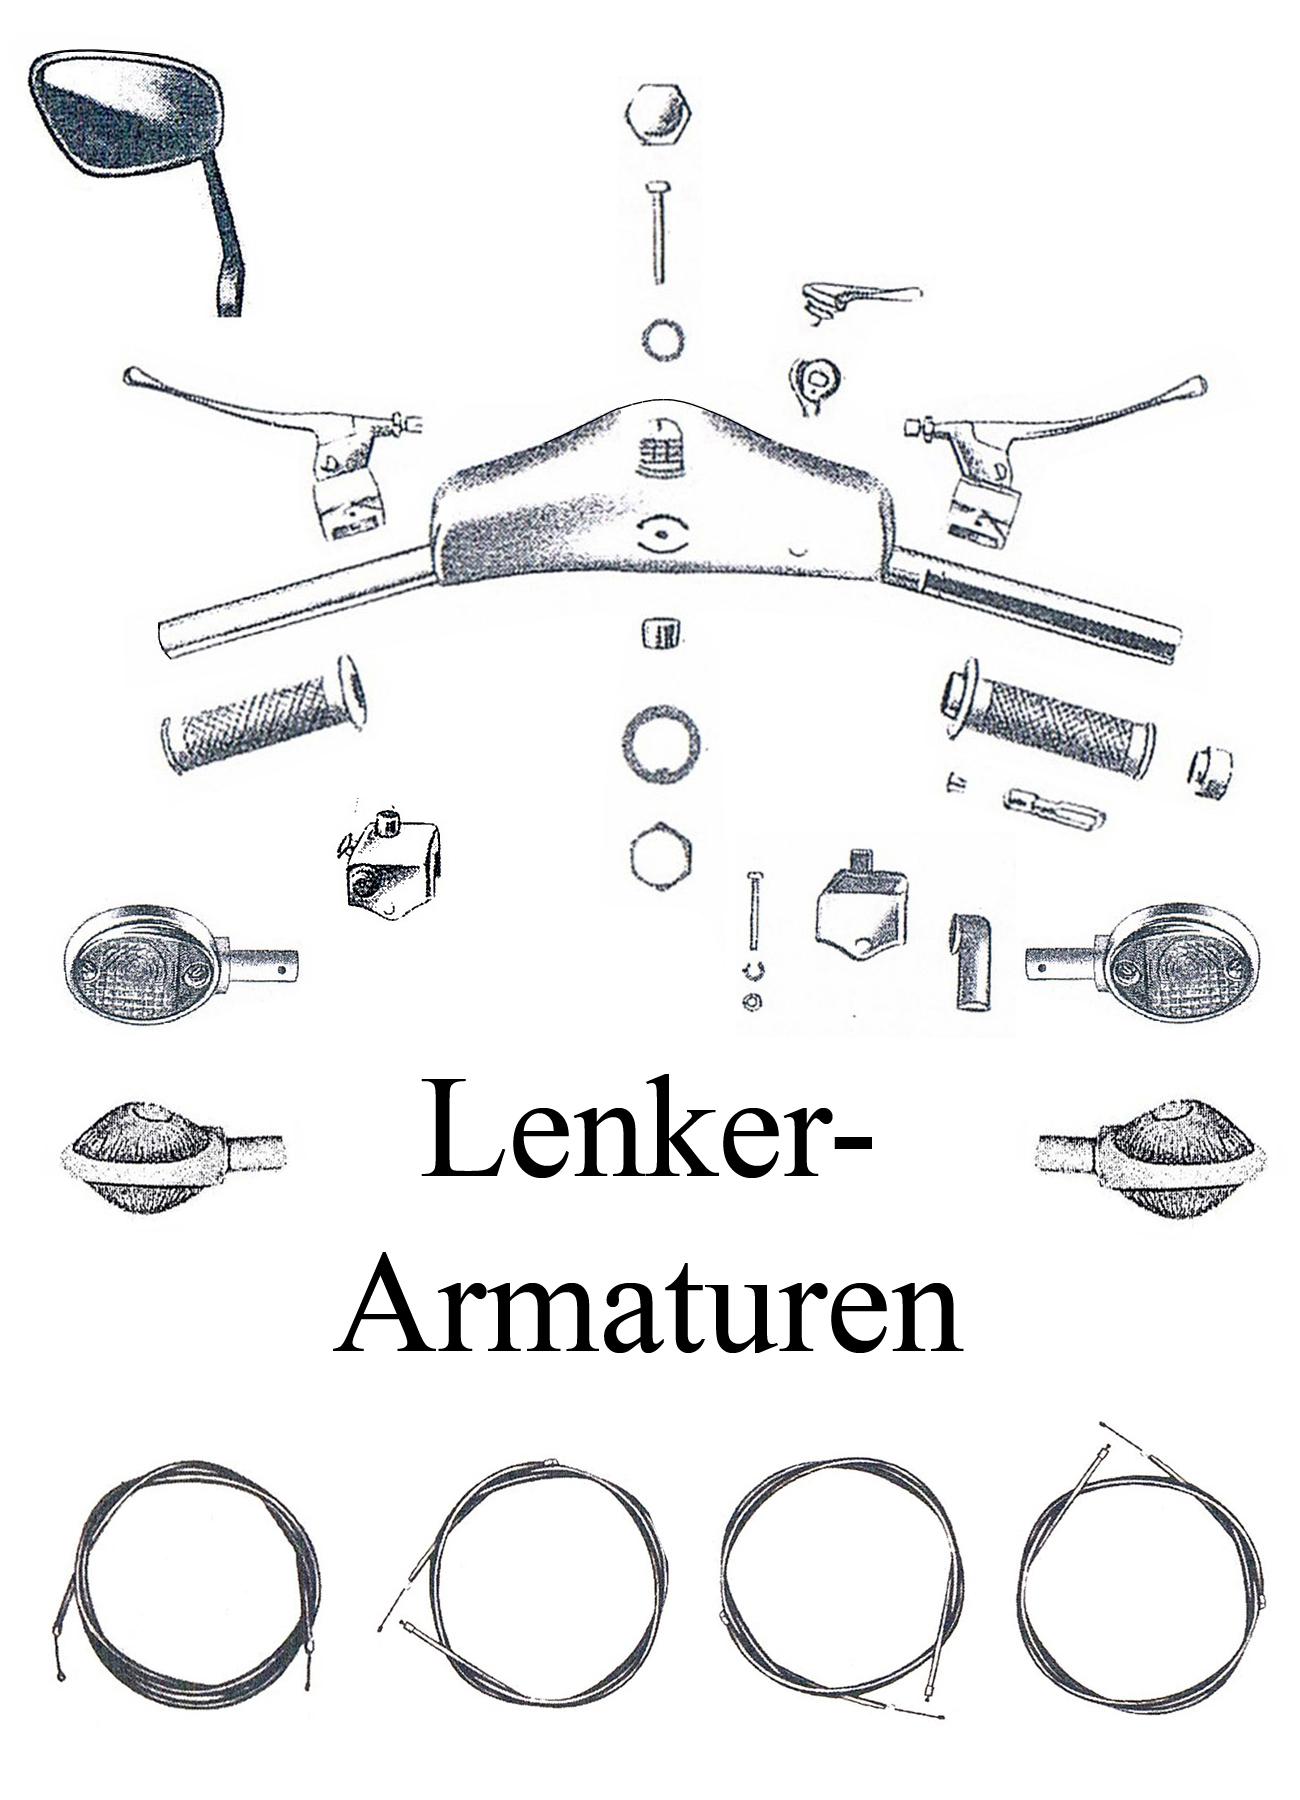 MZ ES 125-150/0-1 Ersatzteileliste Lenker Blinker Spiegel Schalter Armaturen